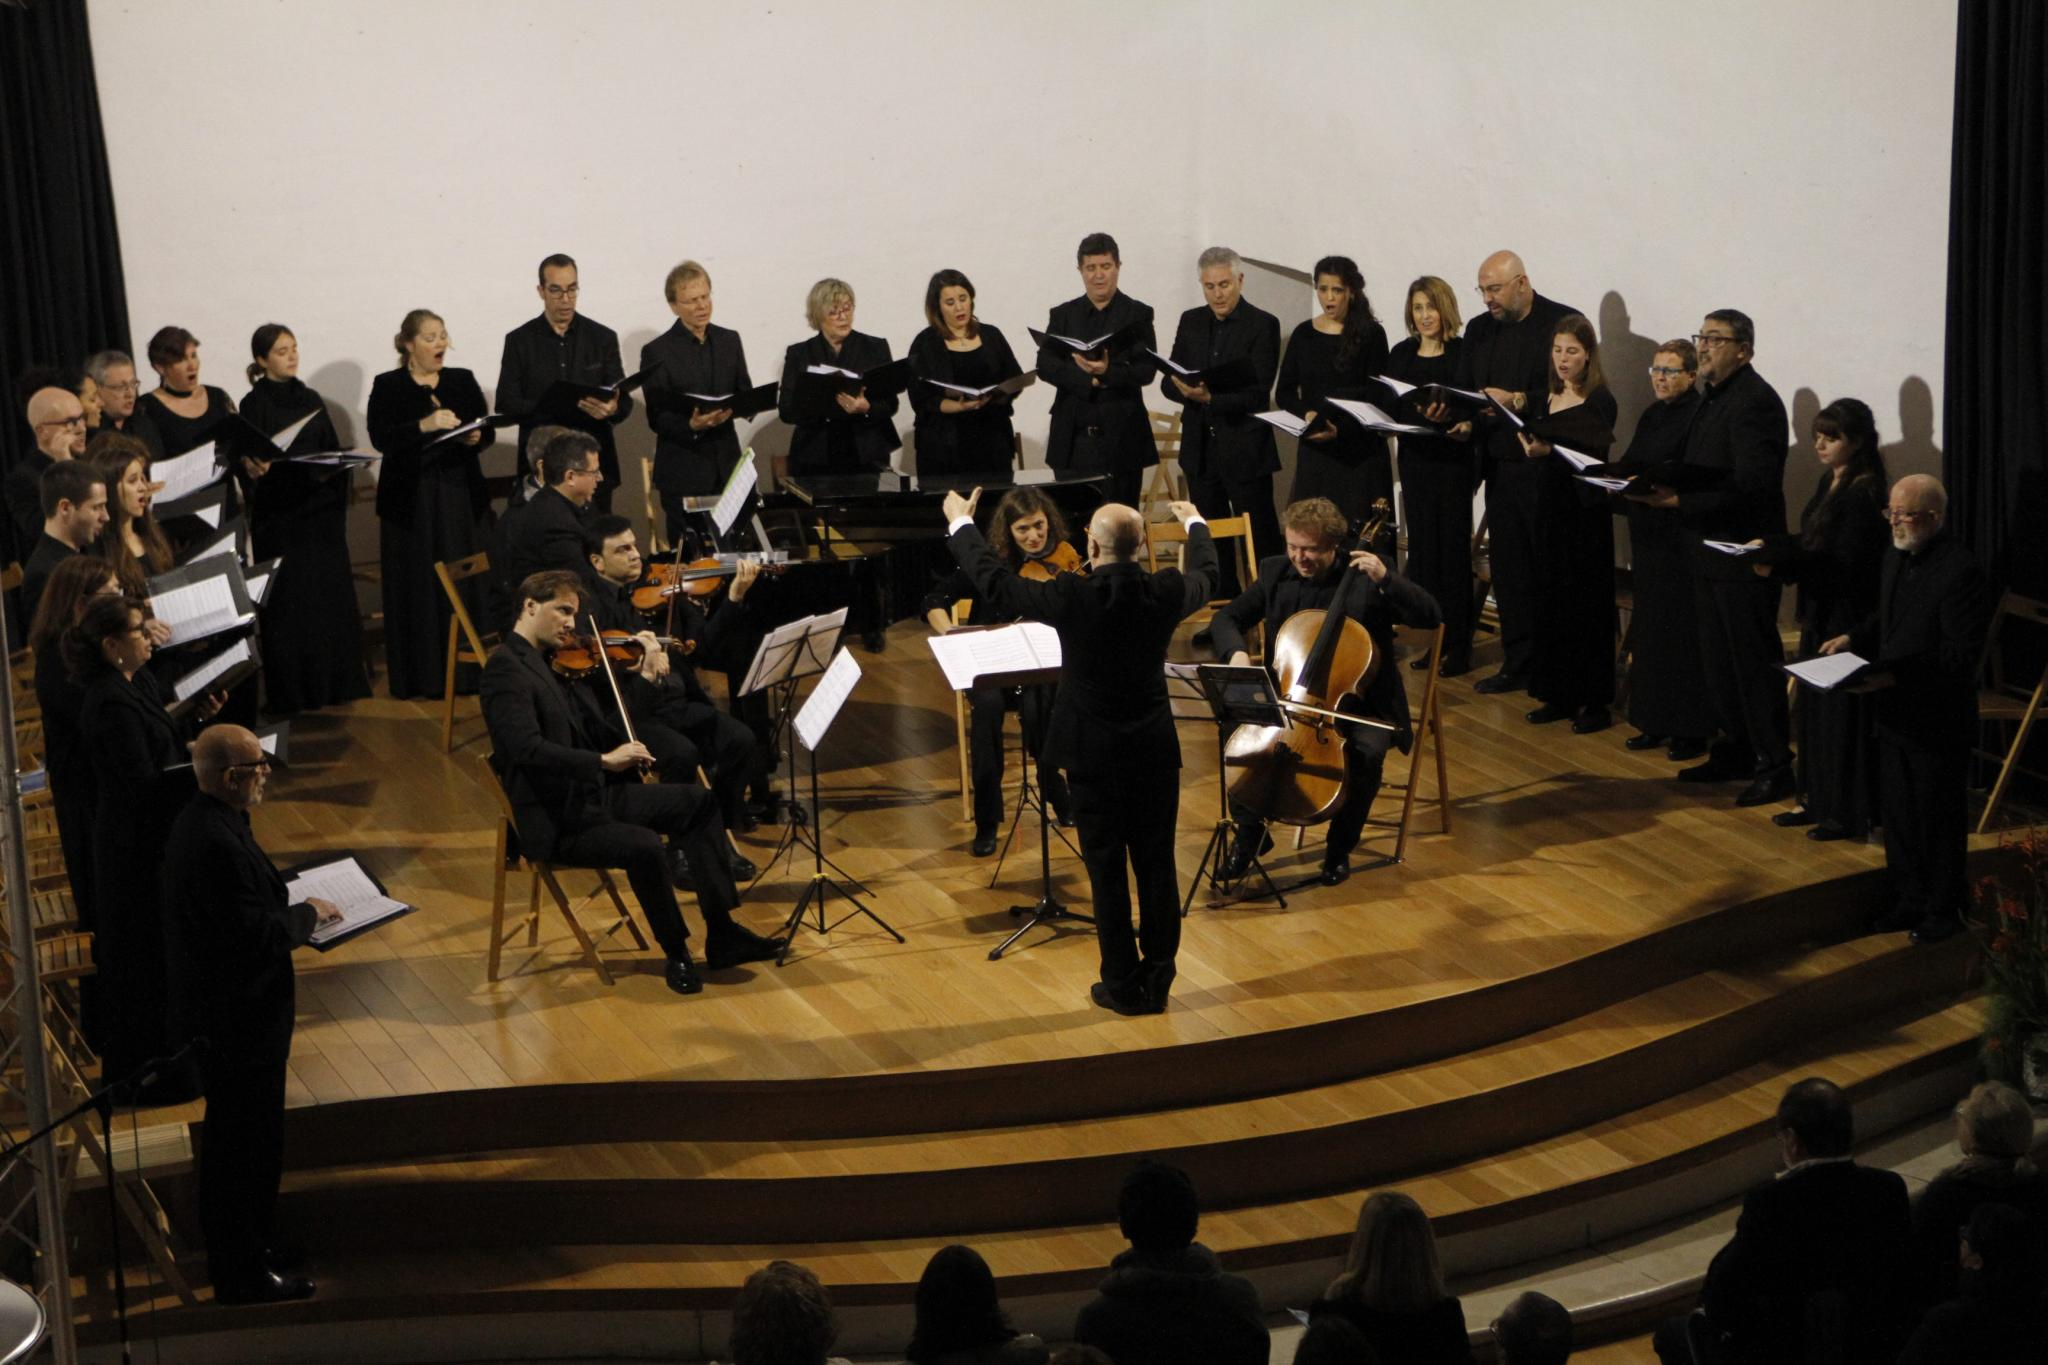 LA CORAL STUDIUM AUREUM OFRECE UN TRIBUTO MUSICAL A VICENTE ROTGER EN EL CONVENT DE SANT DIEGO.